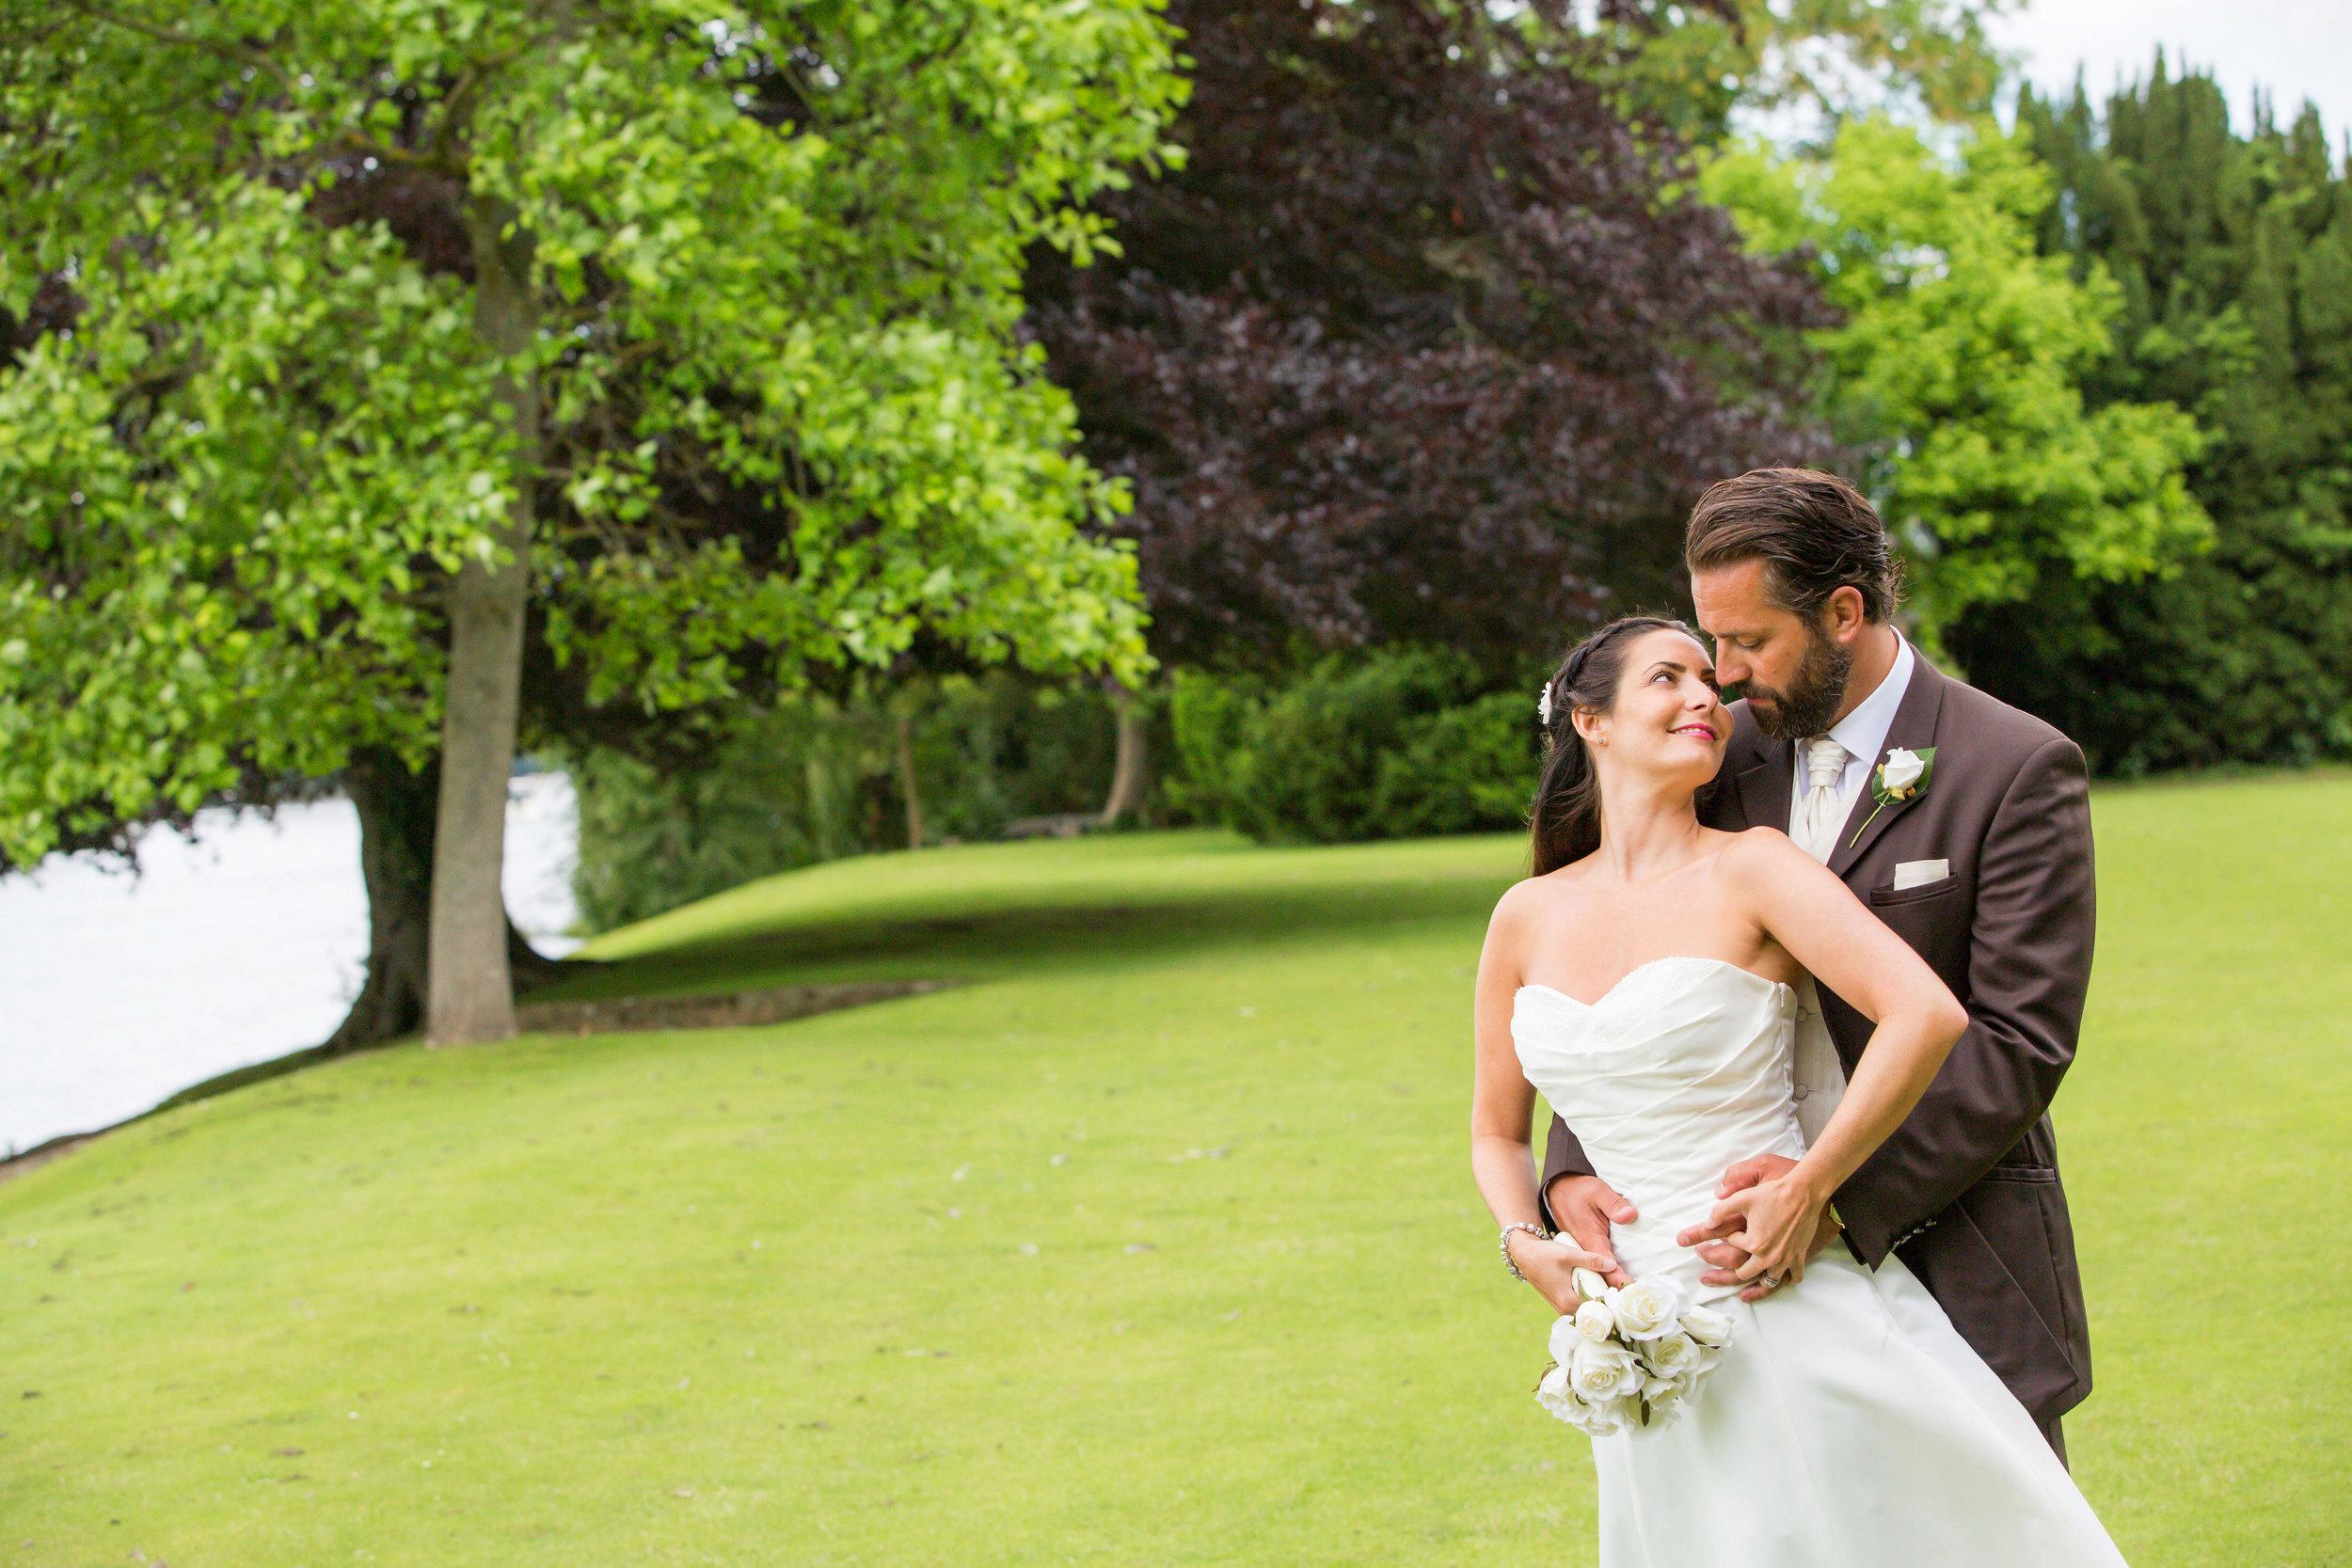 essex_wedding_photographer-18.jpg